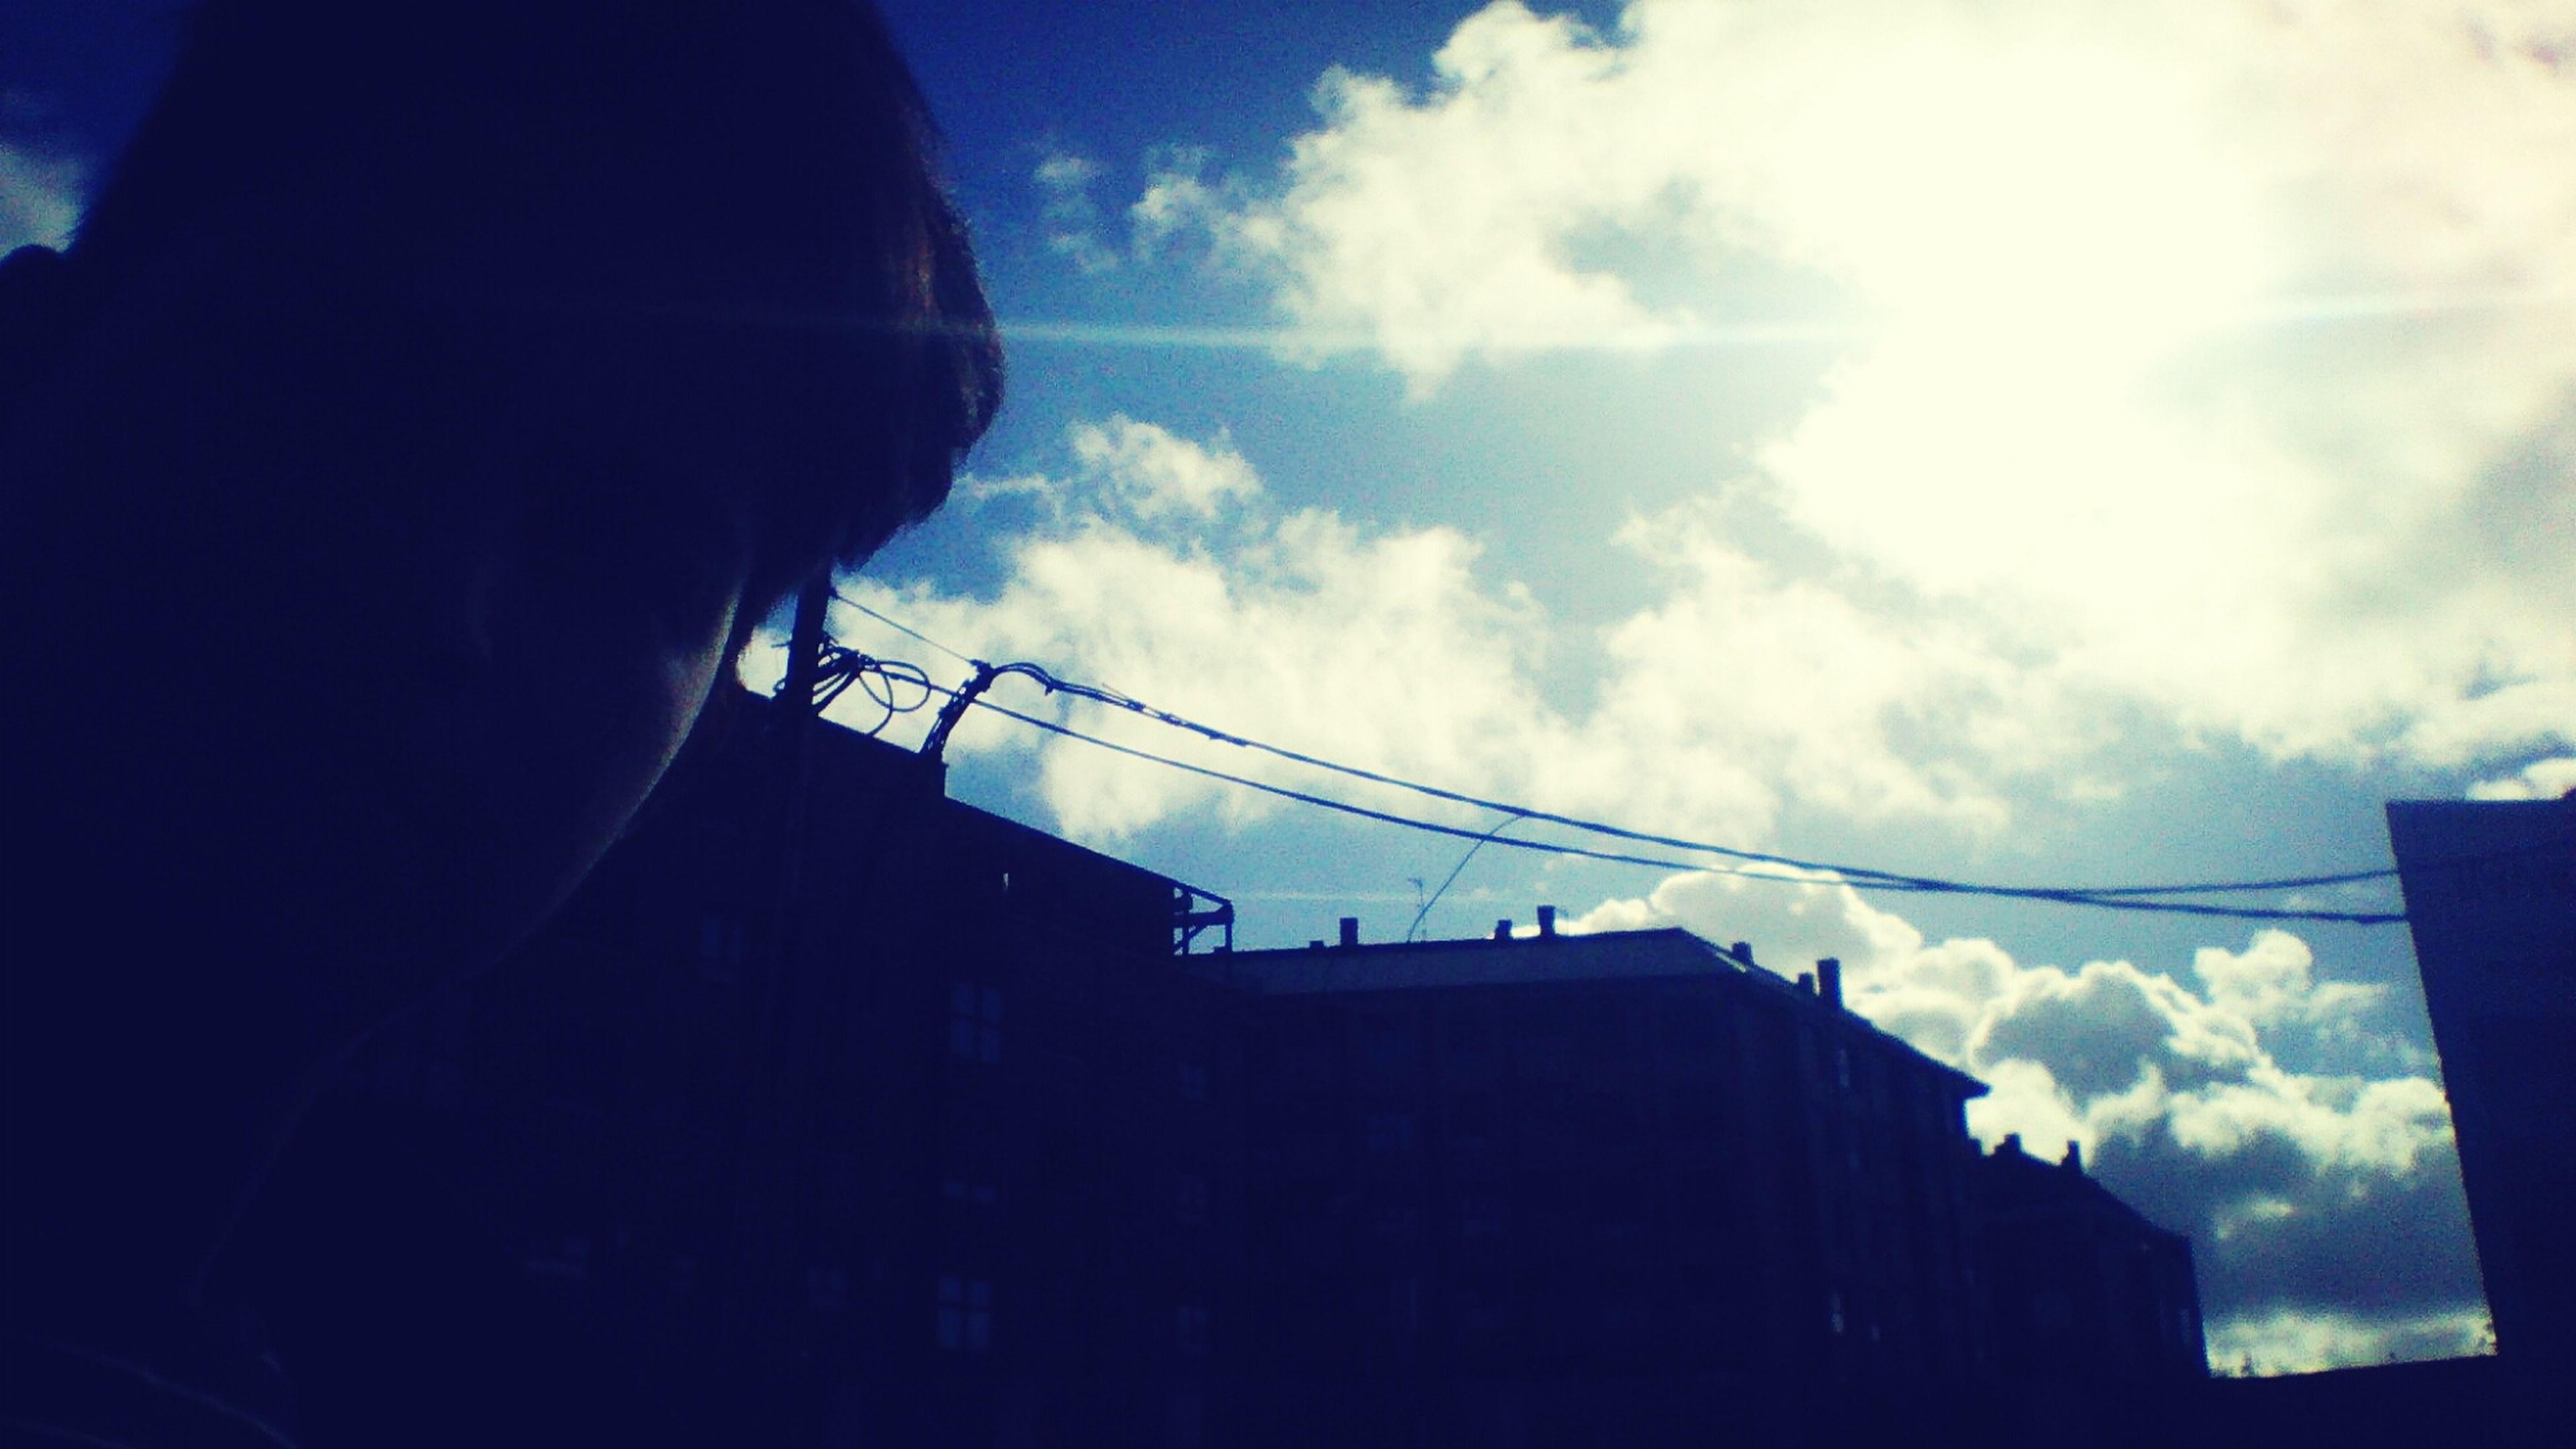 low angle view, silhouette, sky, built structure, architecture, building exterior, cloud - sky, cloud, power line, building, cable, connection, dusk, outdoors, technology, cloudy, blue, electricity pylon, sunlight, city